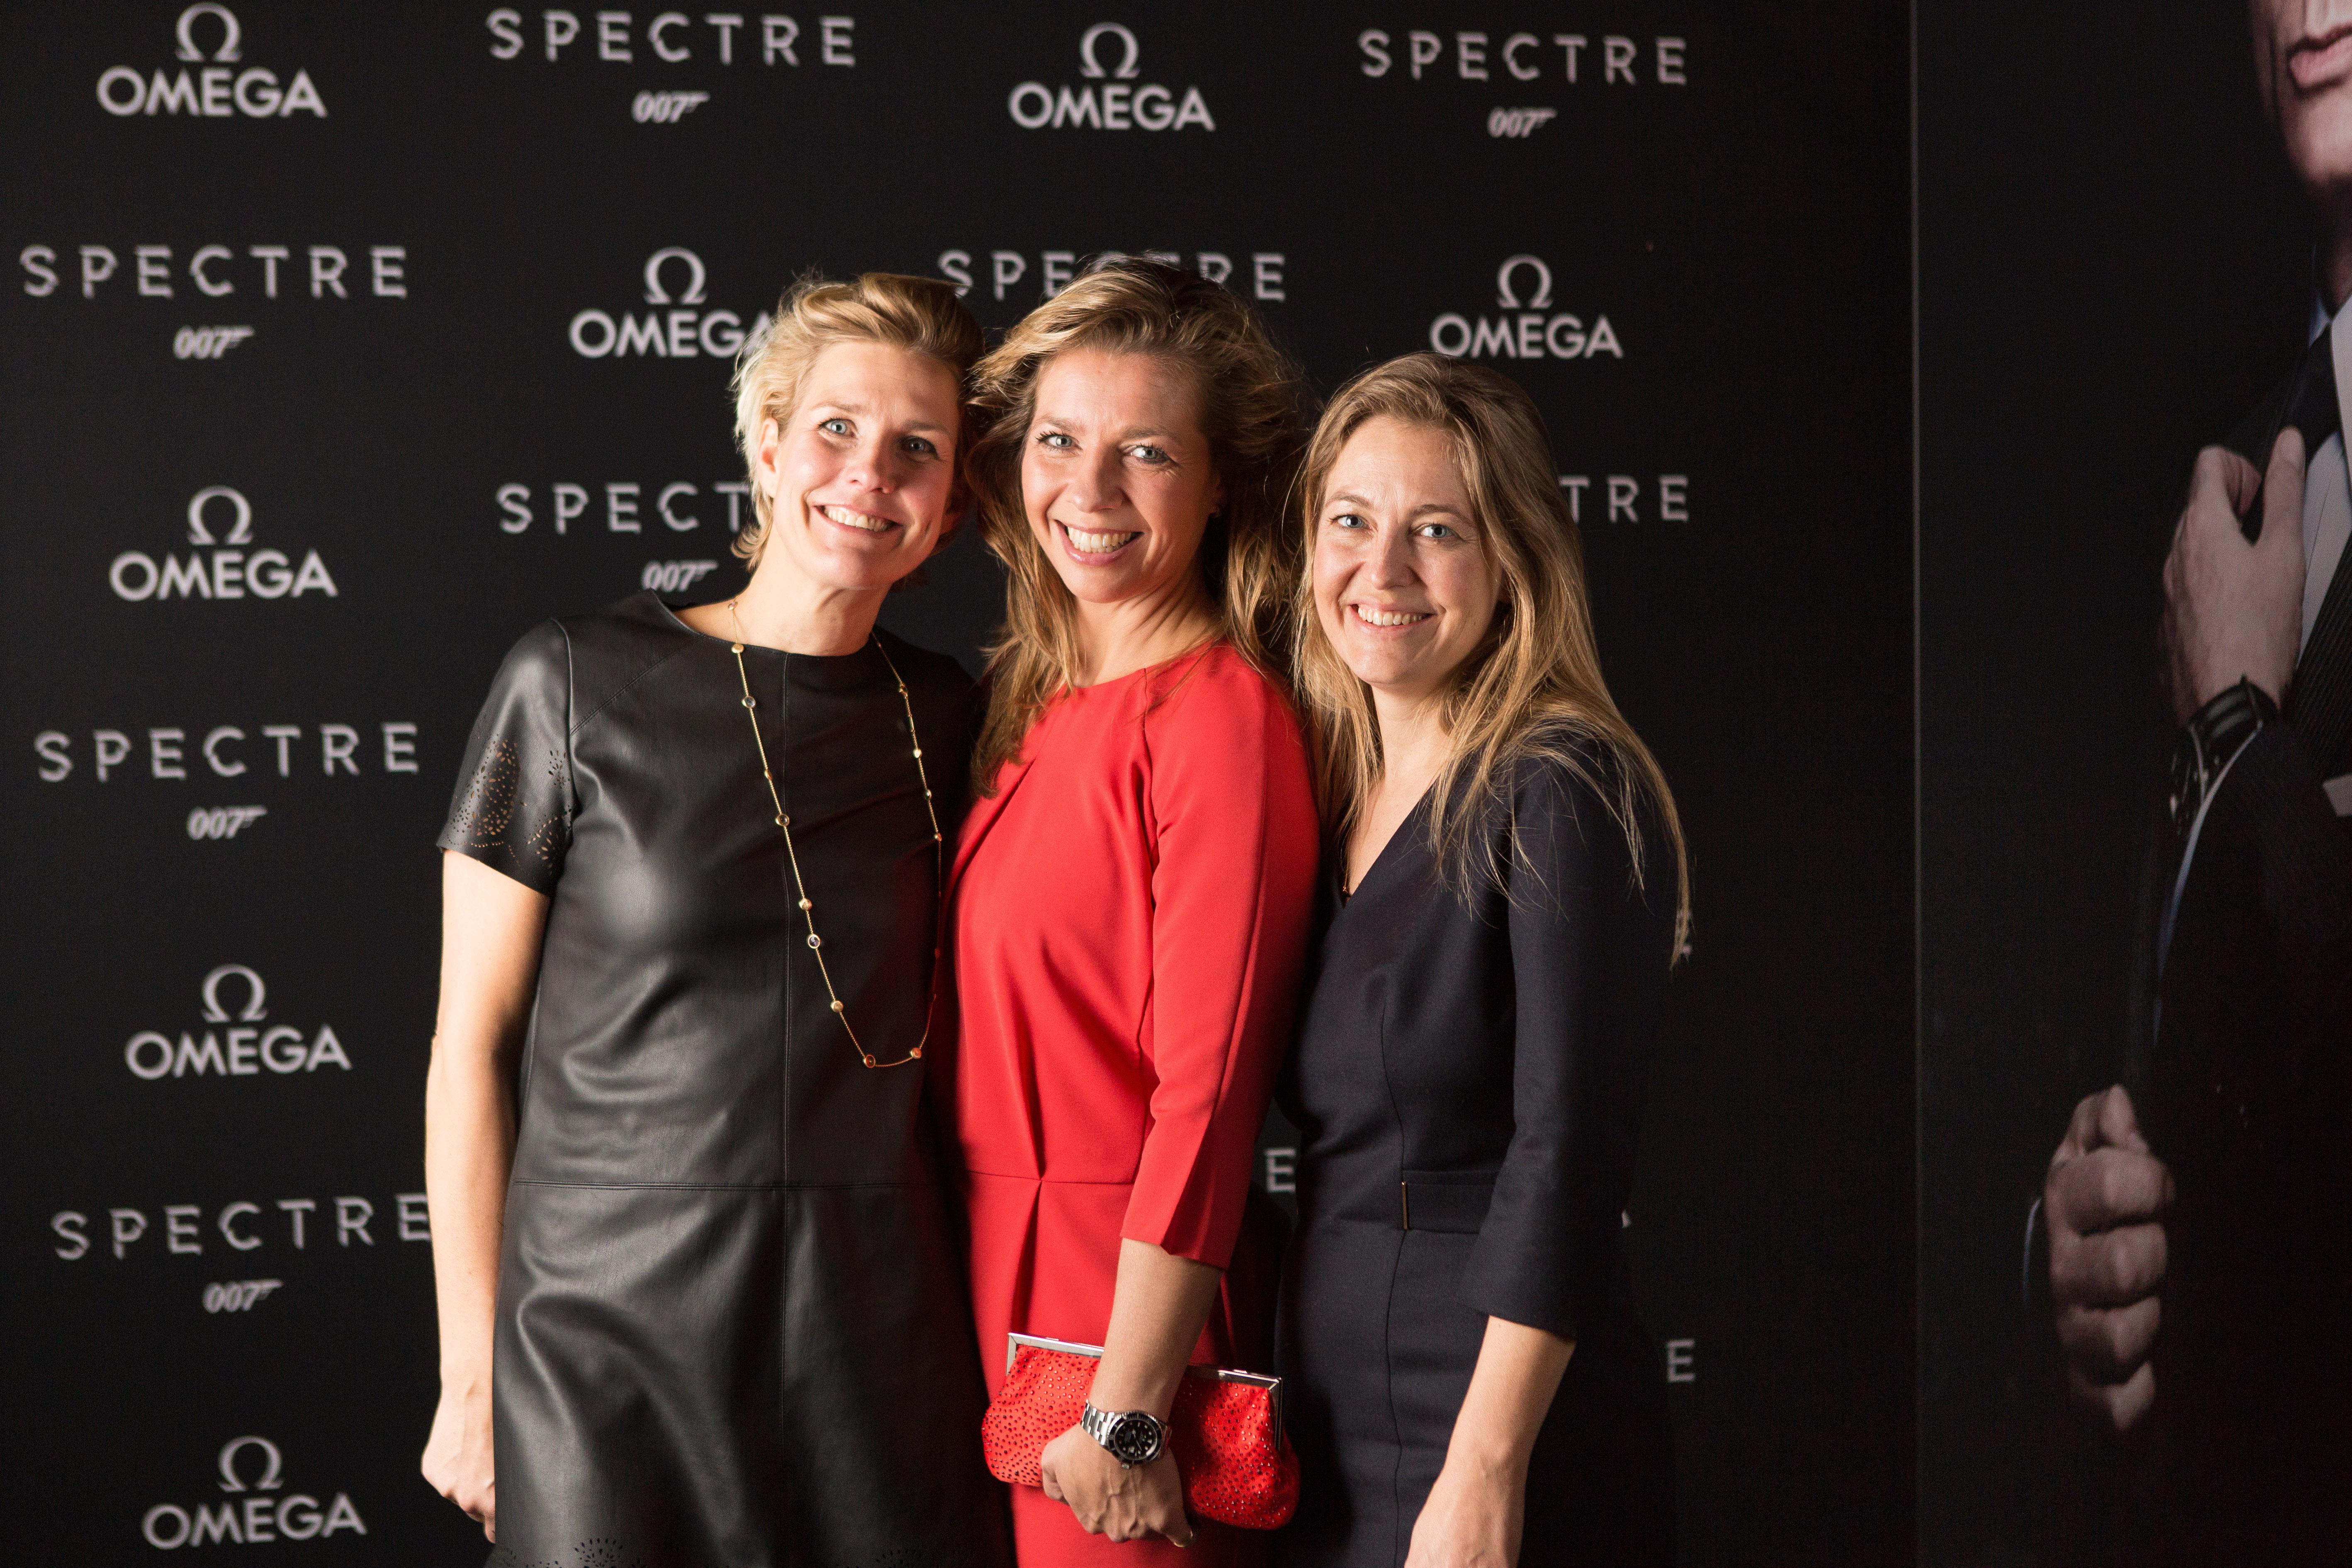 spectre-omega wall-33